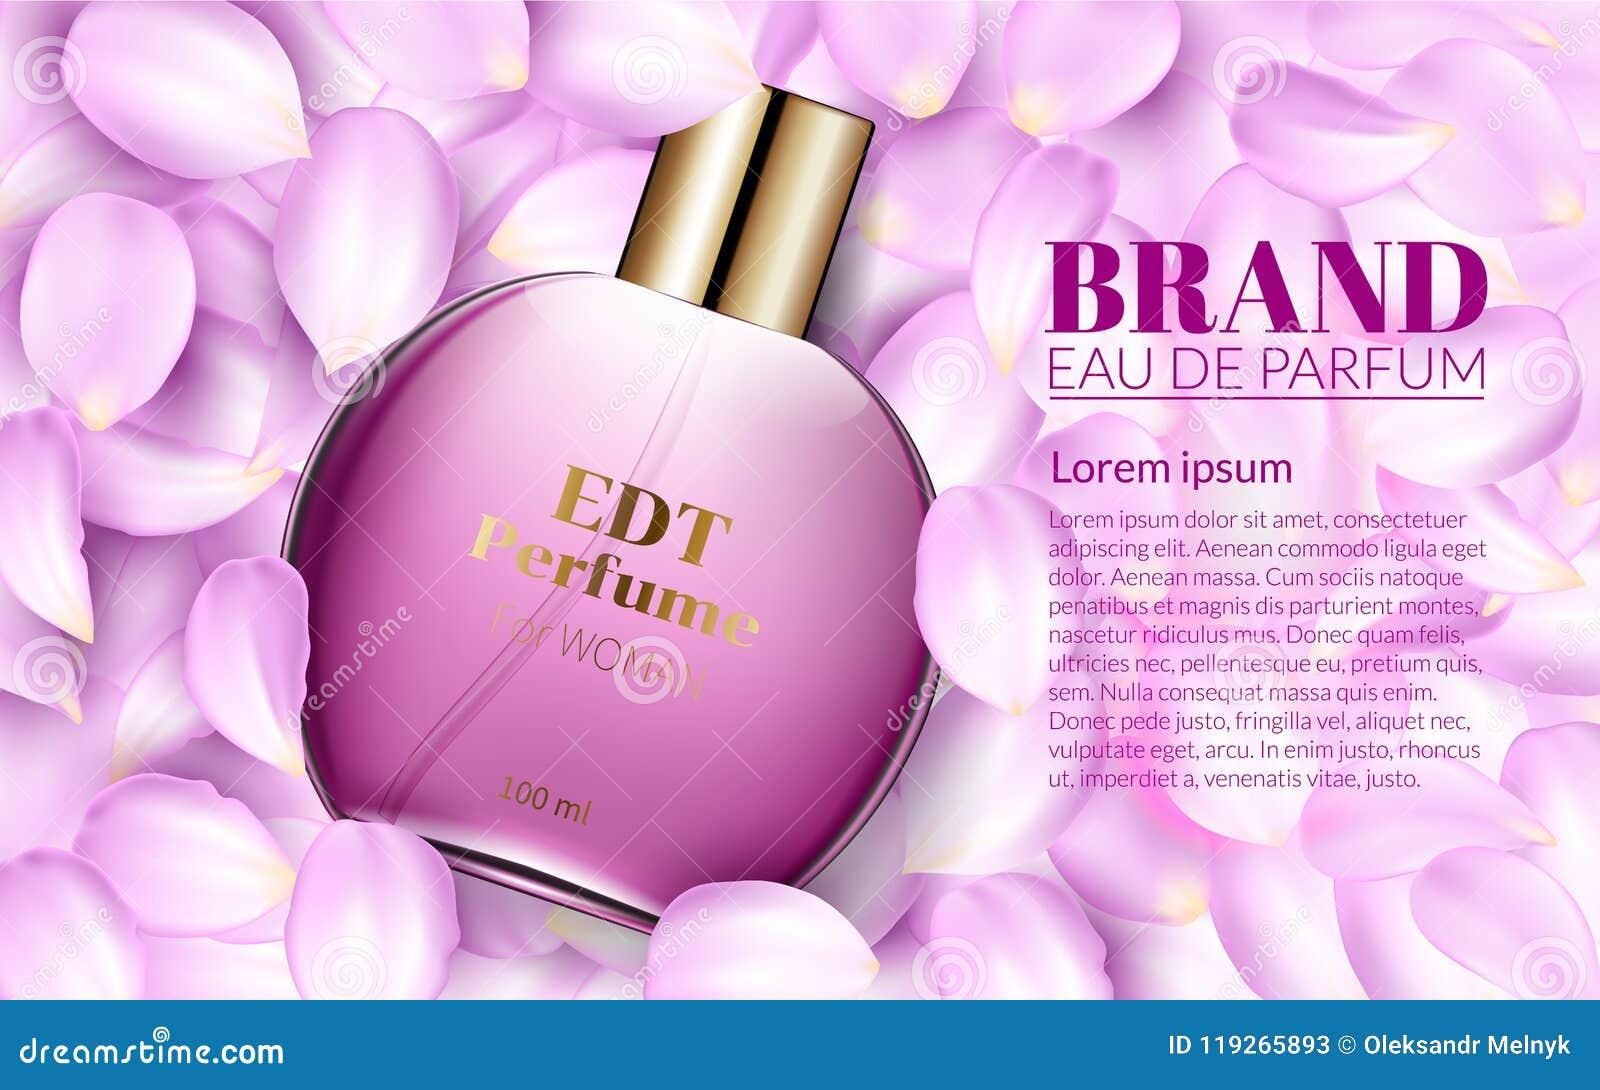 Perfume Glass Bottle Lies On The Pink Flower Petals Design